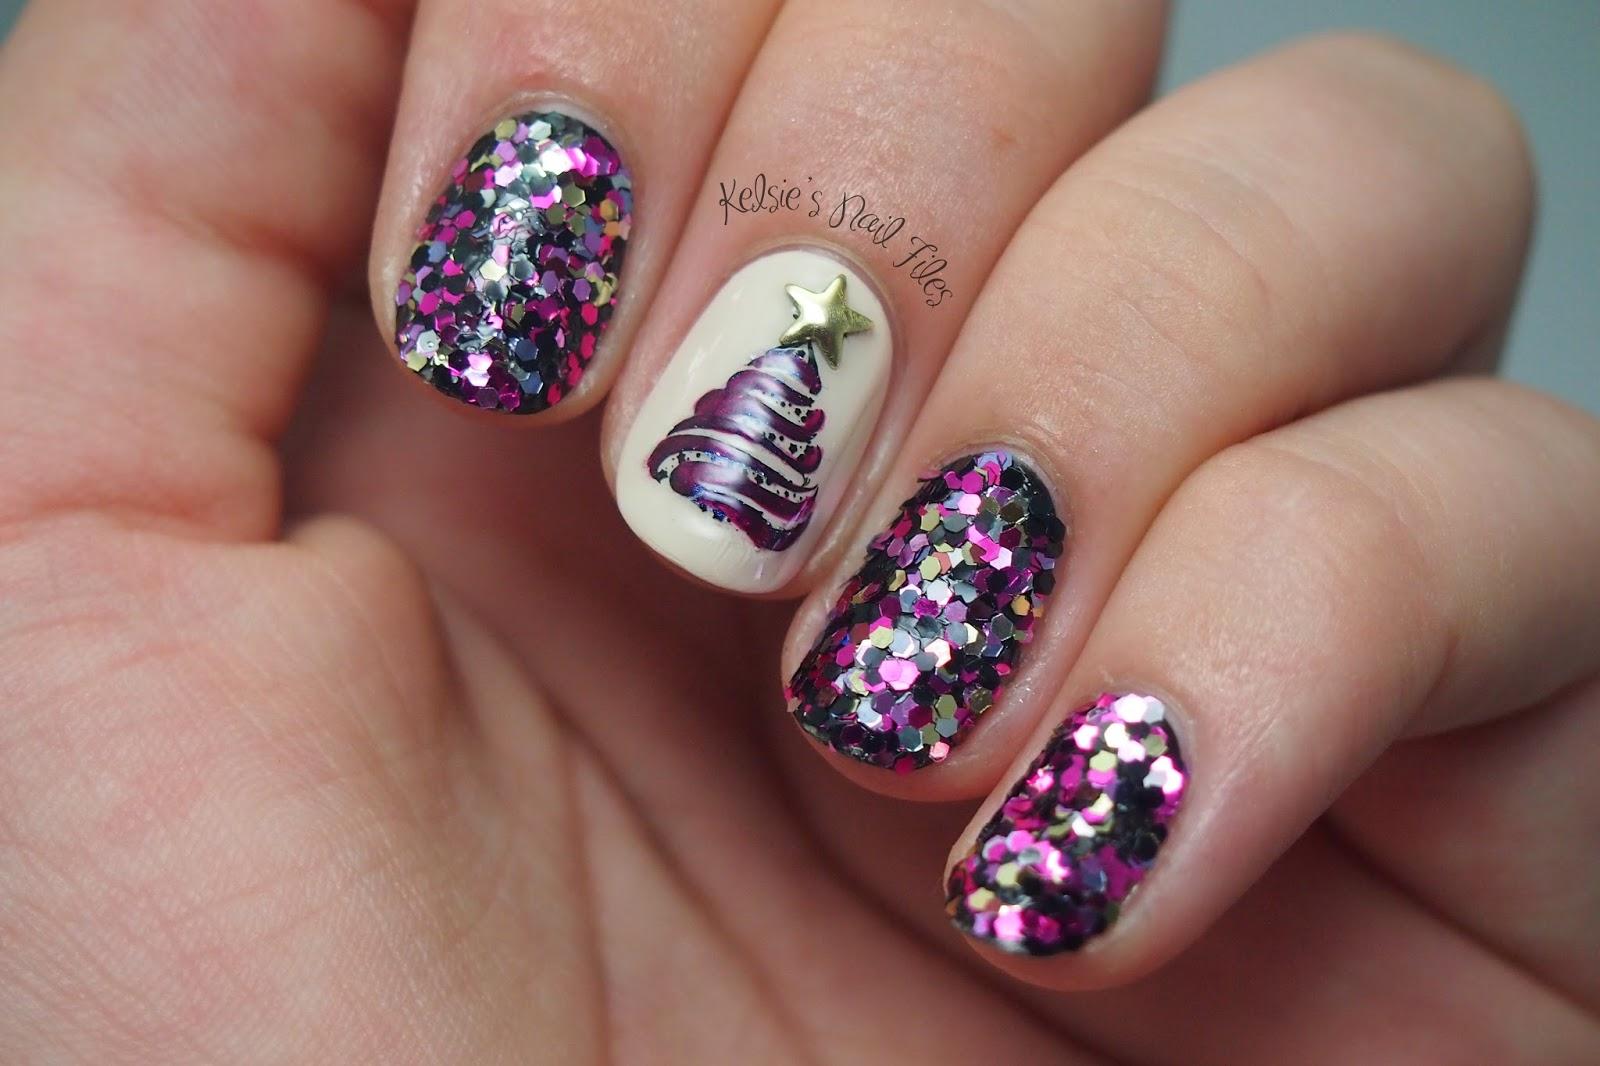 Kelsies nail files winter nail art challenge christmas tree day 5 of the winter nail art challenge christmas tree prinsesfo Gallery